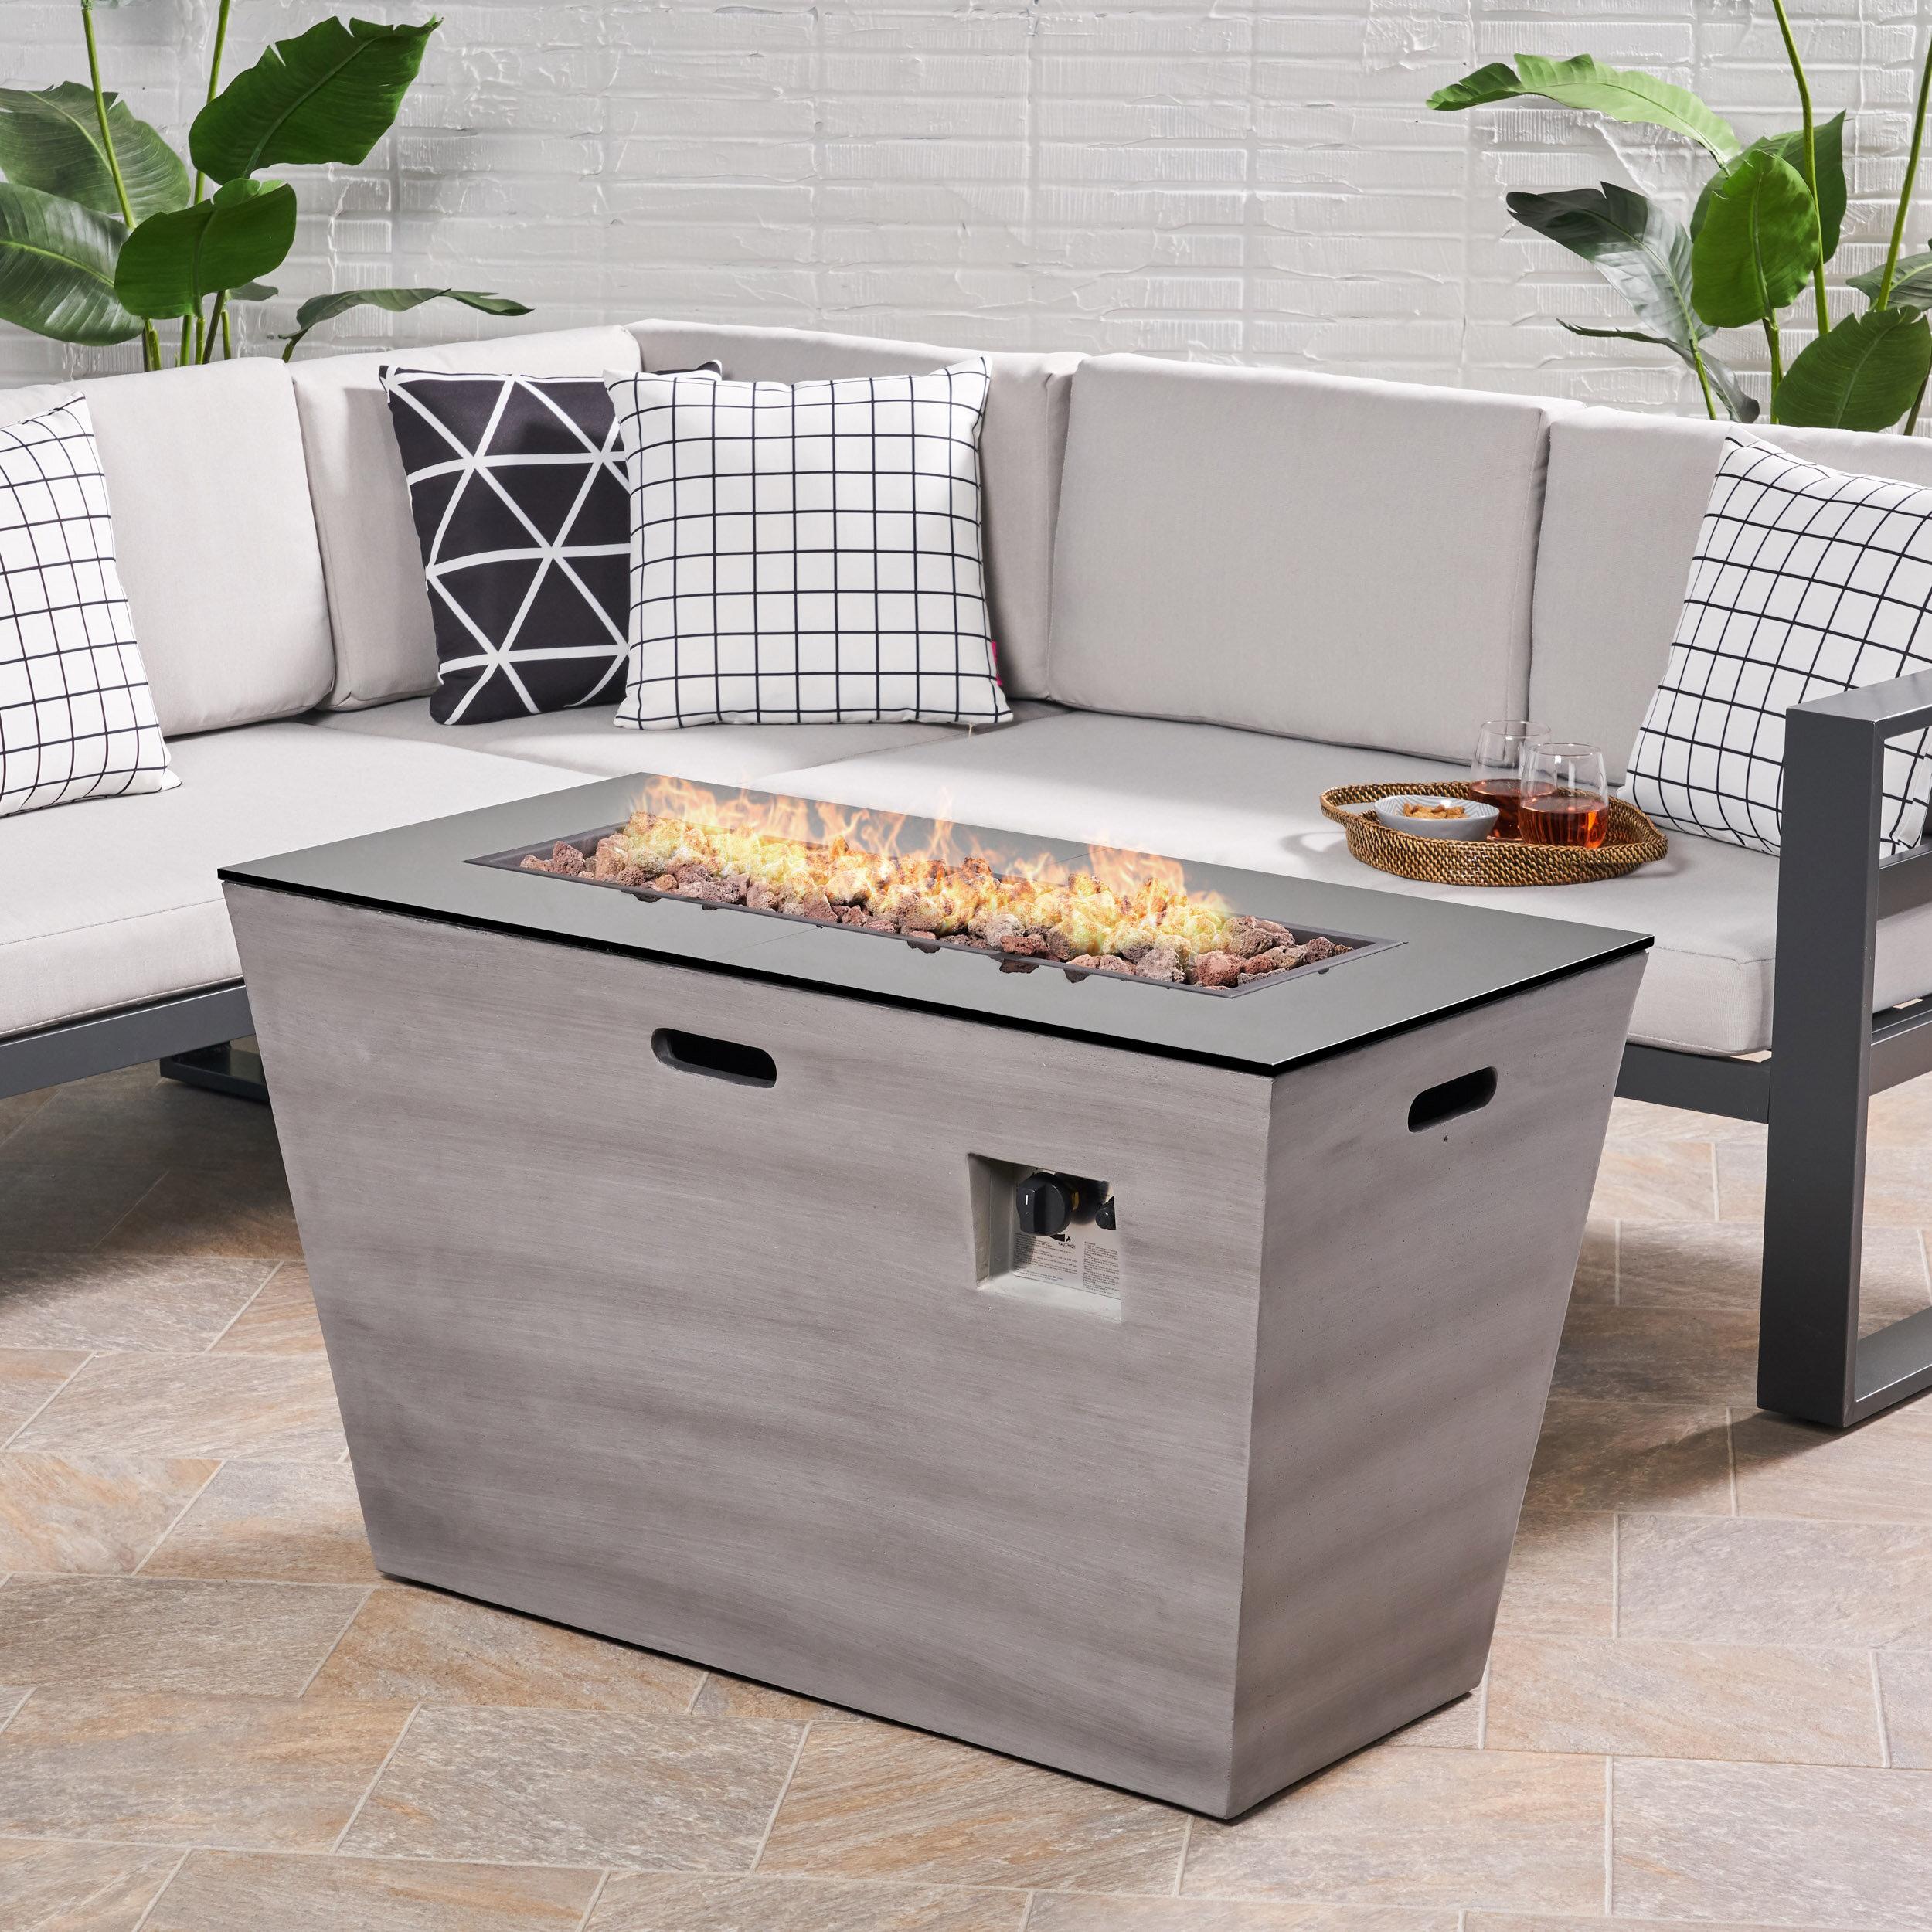 Orren Ellis Berkshire Outdoor Modern Concrete Propane Fire Pit Table Reviews Wayfair